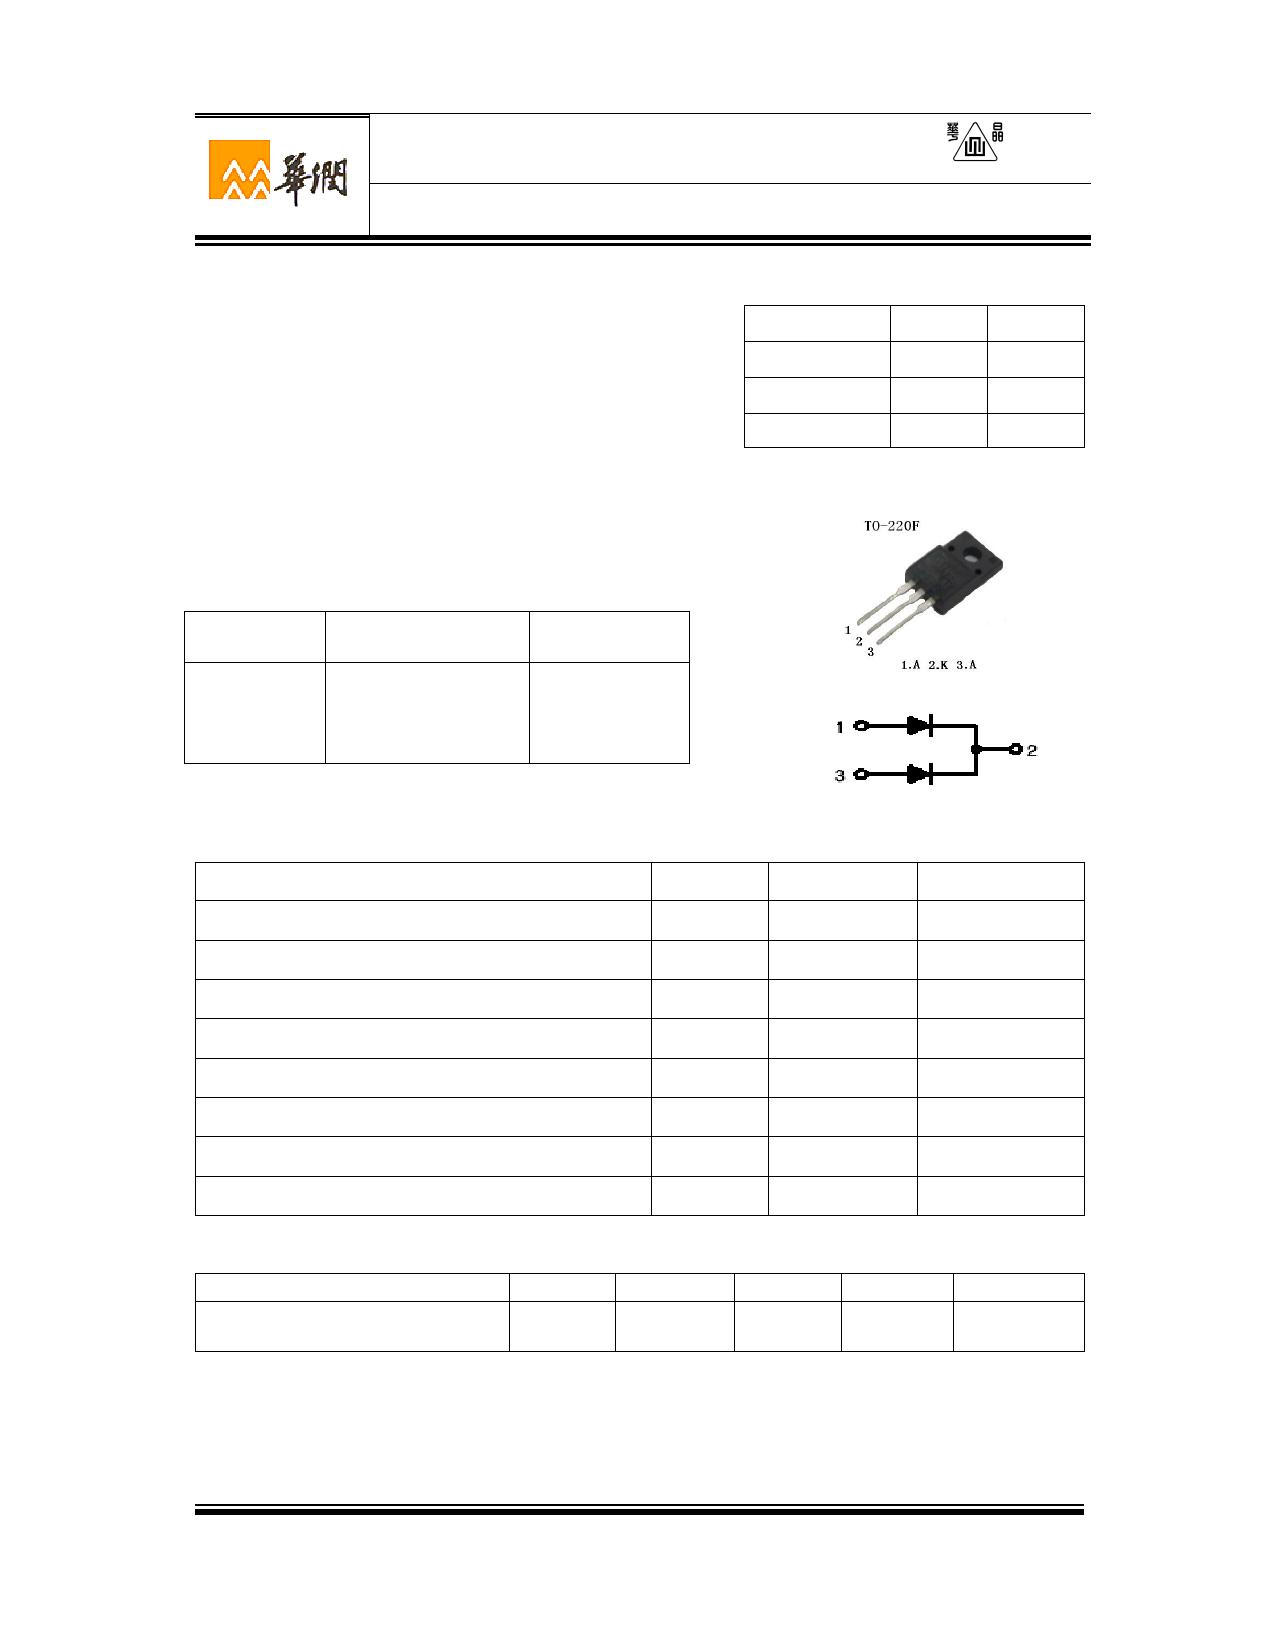 2CZ10150A9 Datasheet, 2CZ10150A9 PDF,ピン配置, 機能